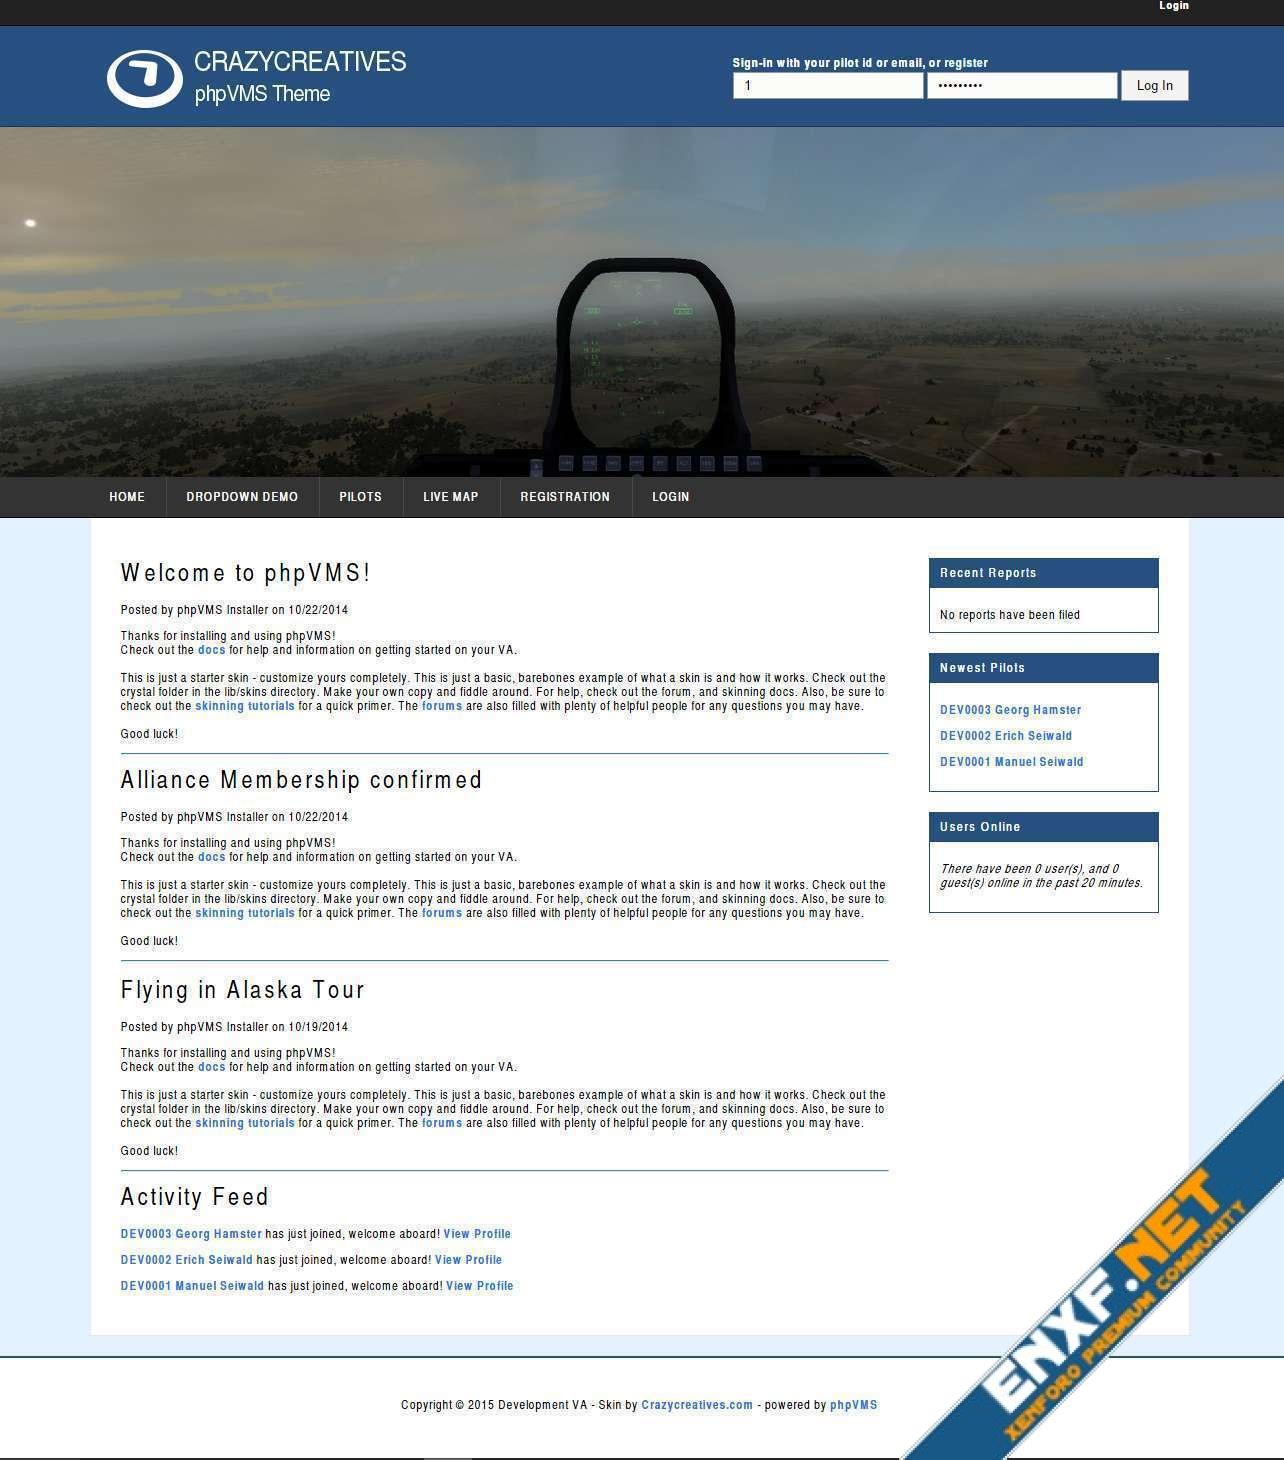 phpVMS Theme – Jetset Basic